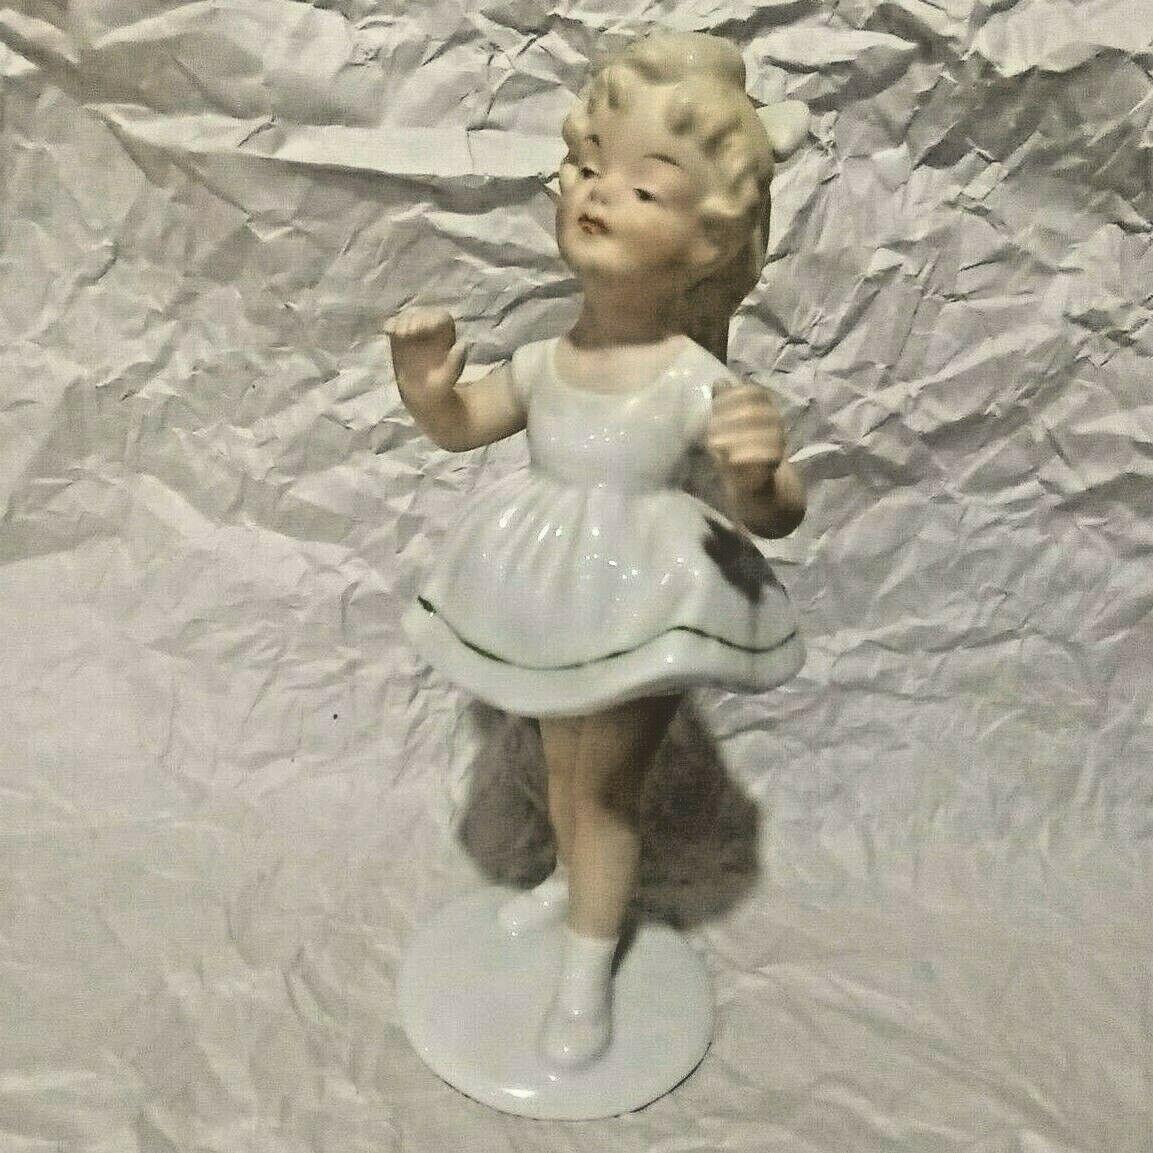 Wallendorf Figurine Little Girl Germany Mould # 1762 Vintage Child German